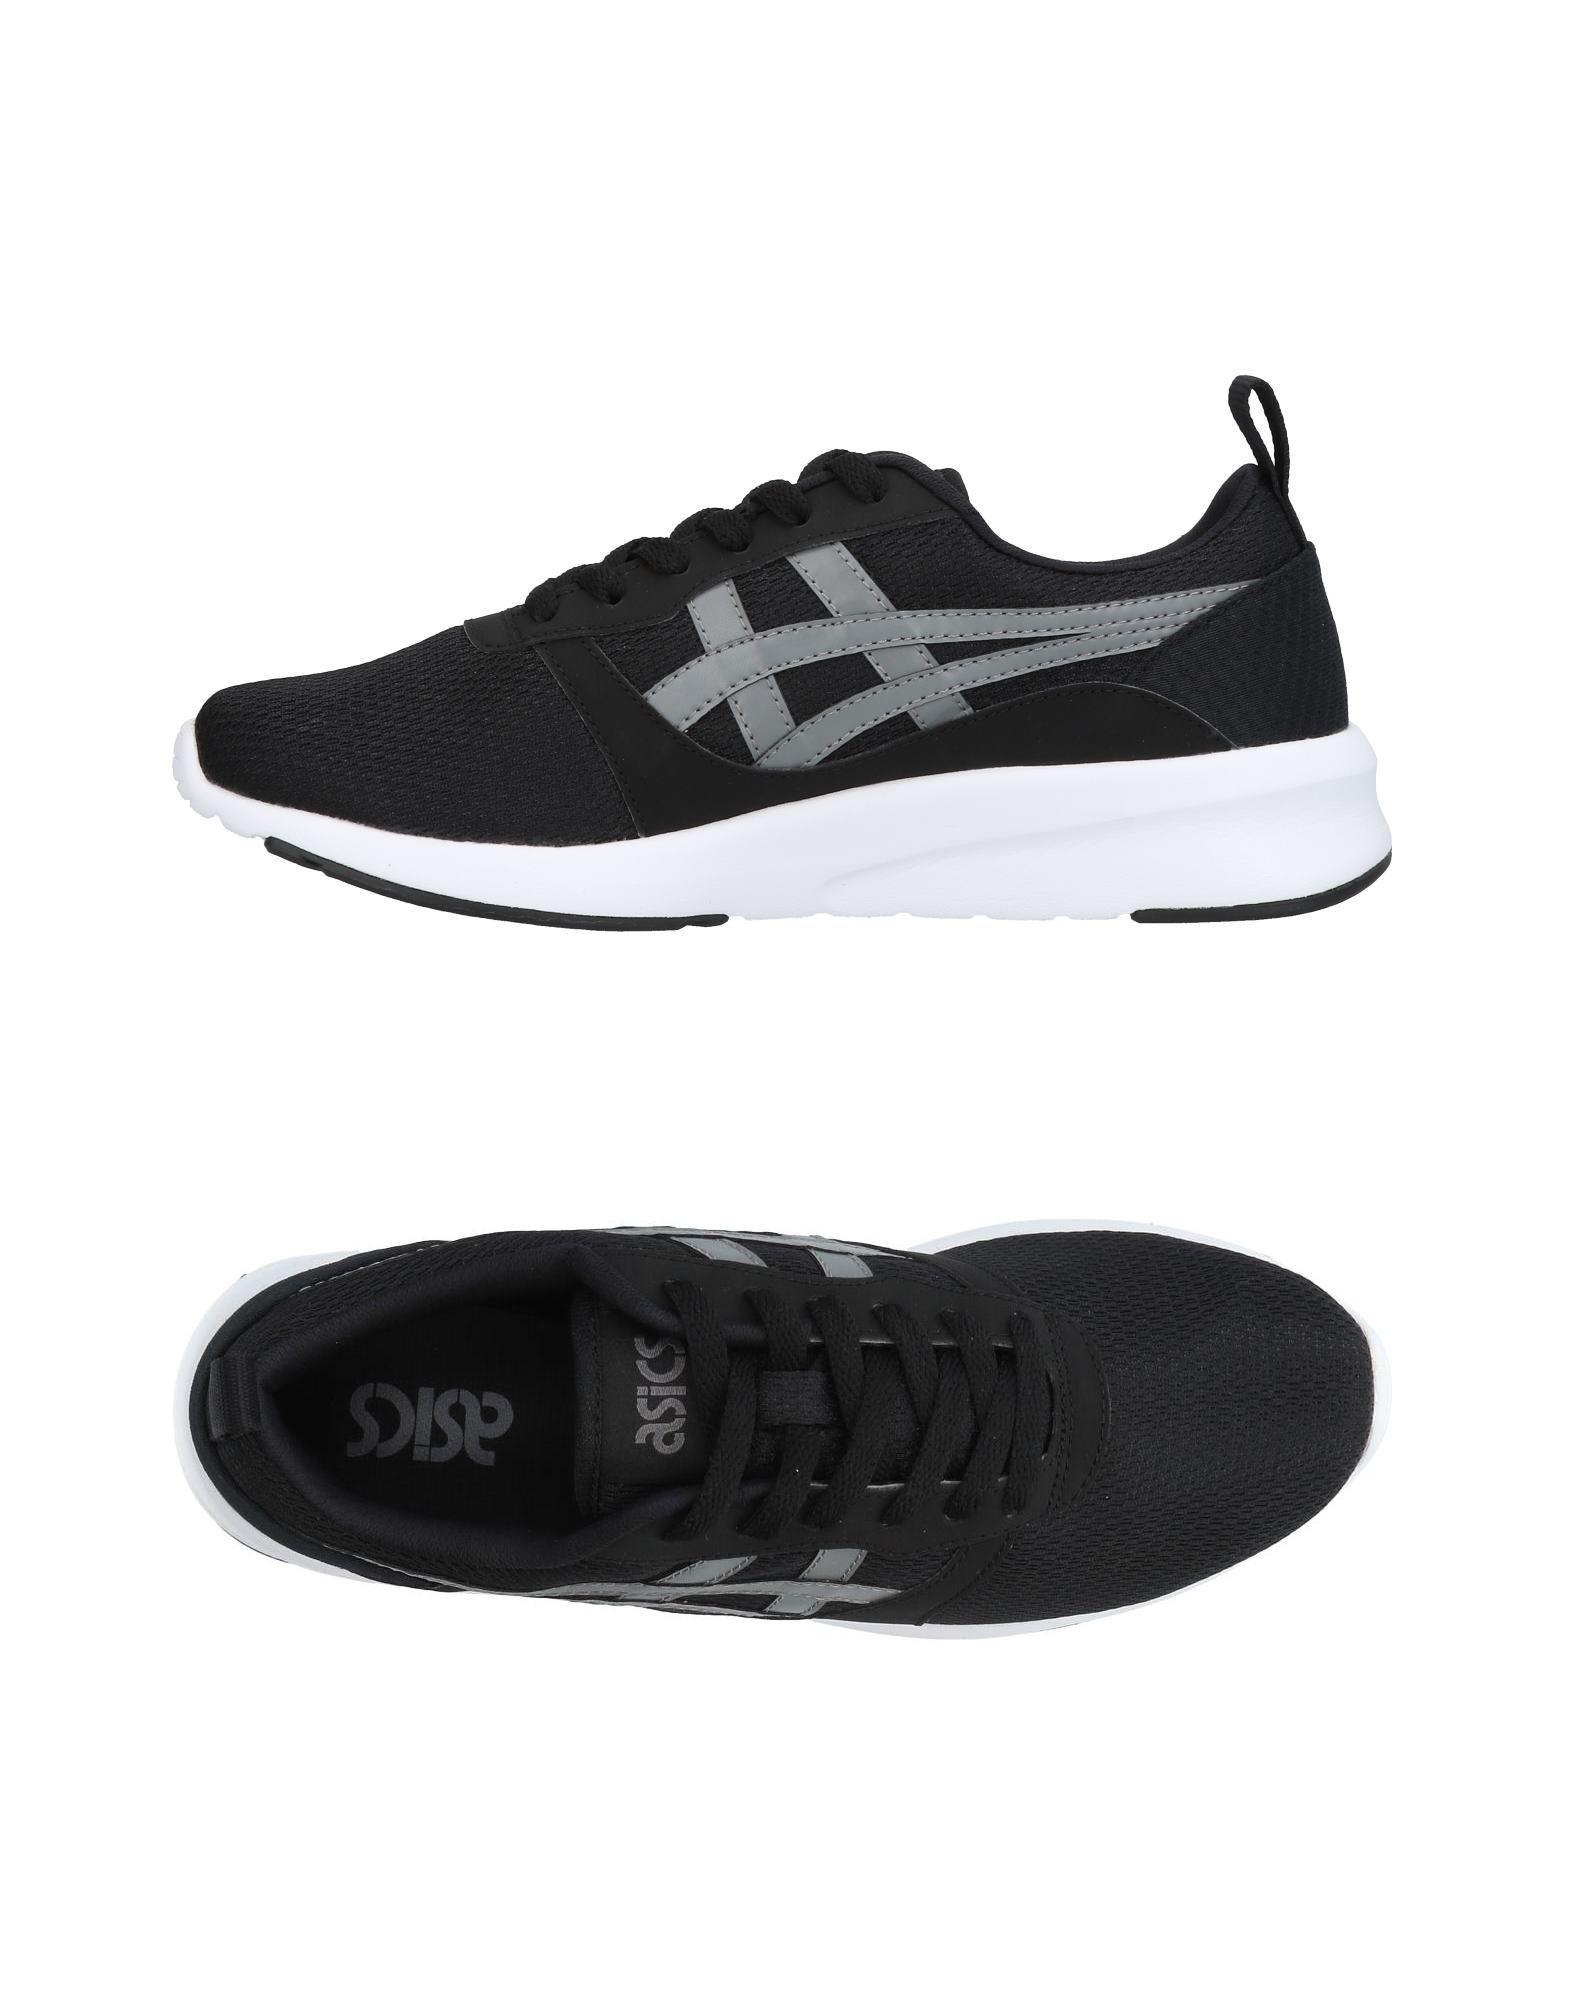 Moda Sneakers Asics Uomo - 11373419TD